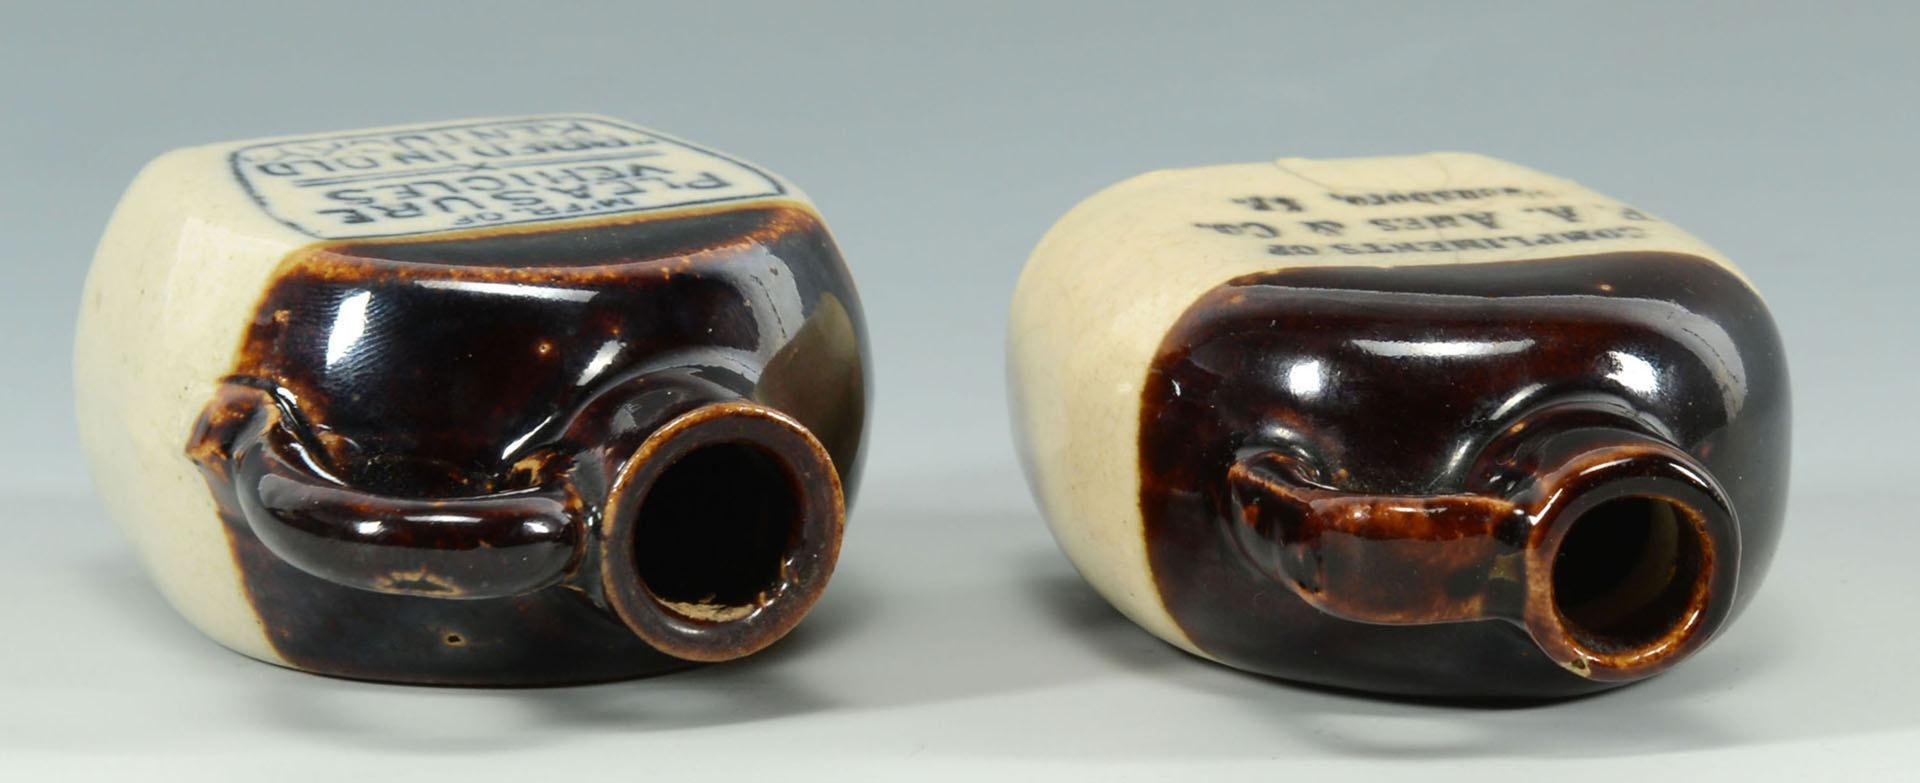 Lot 122: 2 Miniature Kentucky Whiskey Jugs, Owensboro, KY